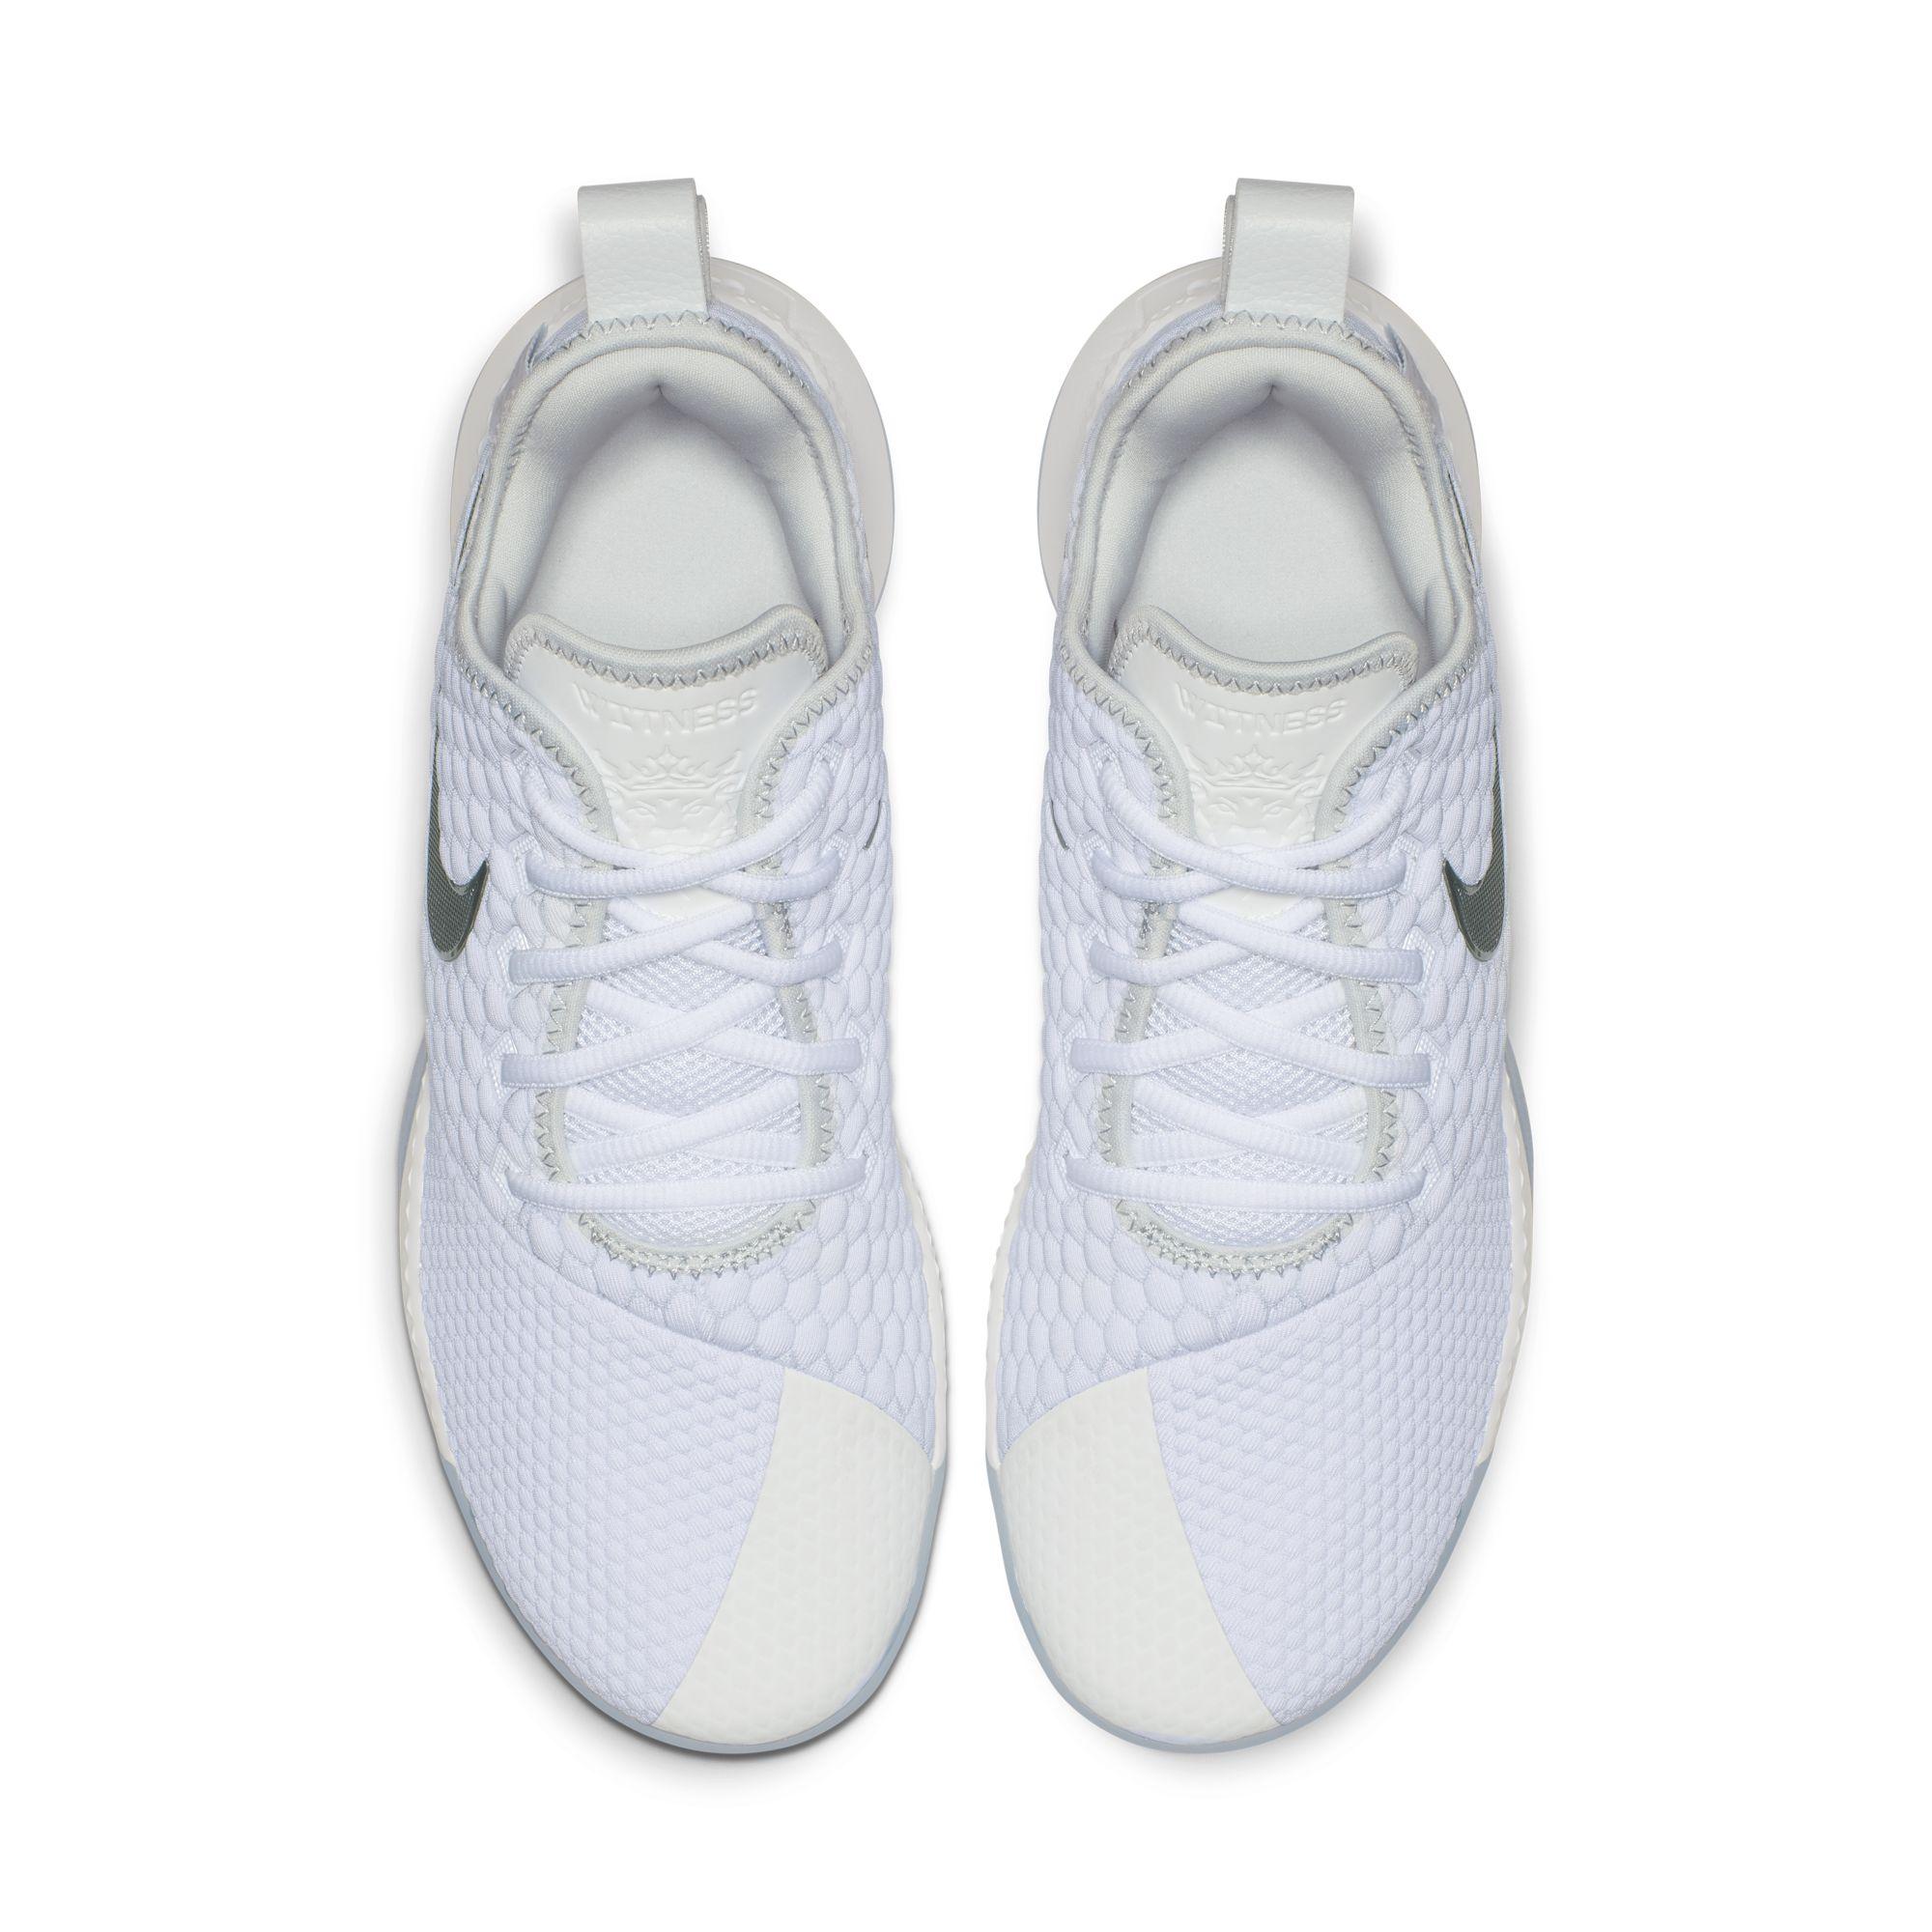 8ae60c4106e NIKE LEBRON WITNESS III WHITE CHROME-PURE PLATINUM 2 - WearTesters